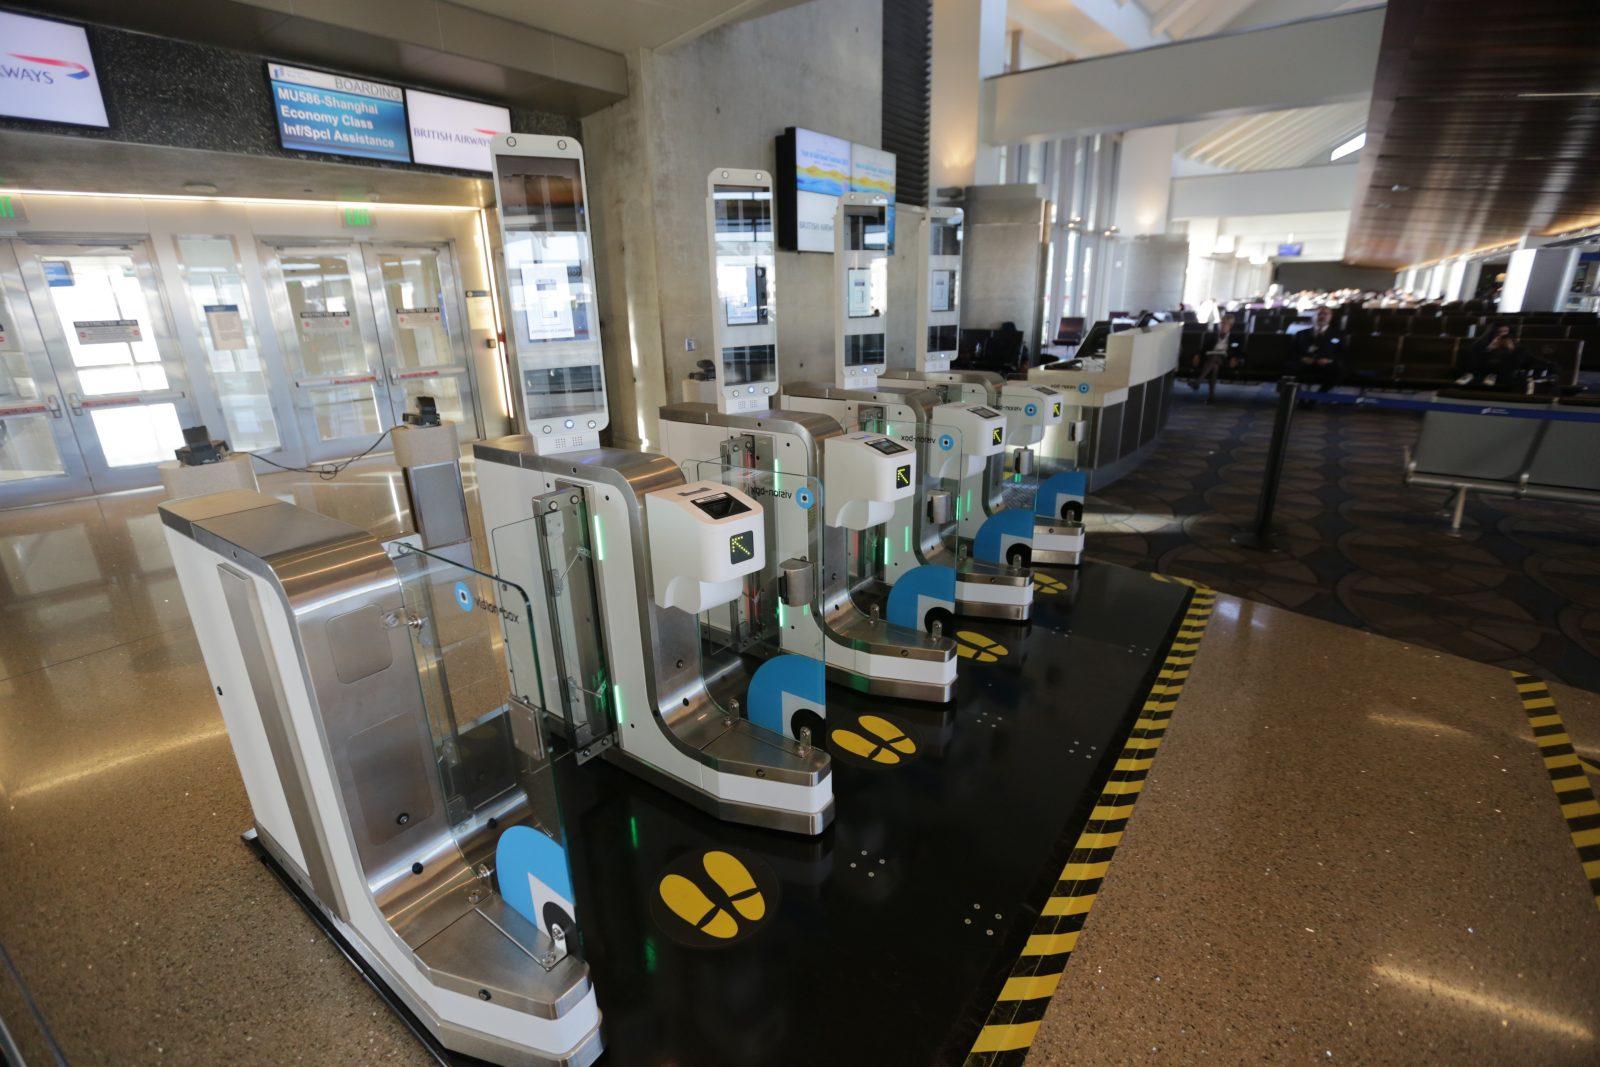 British Airways biometric boarding gates